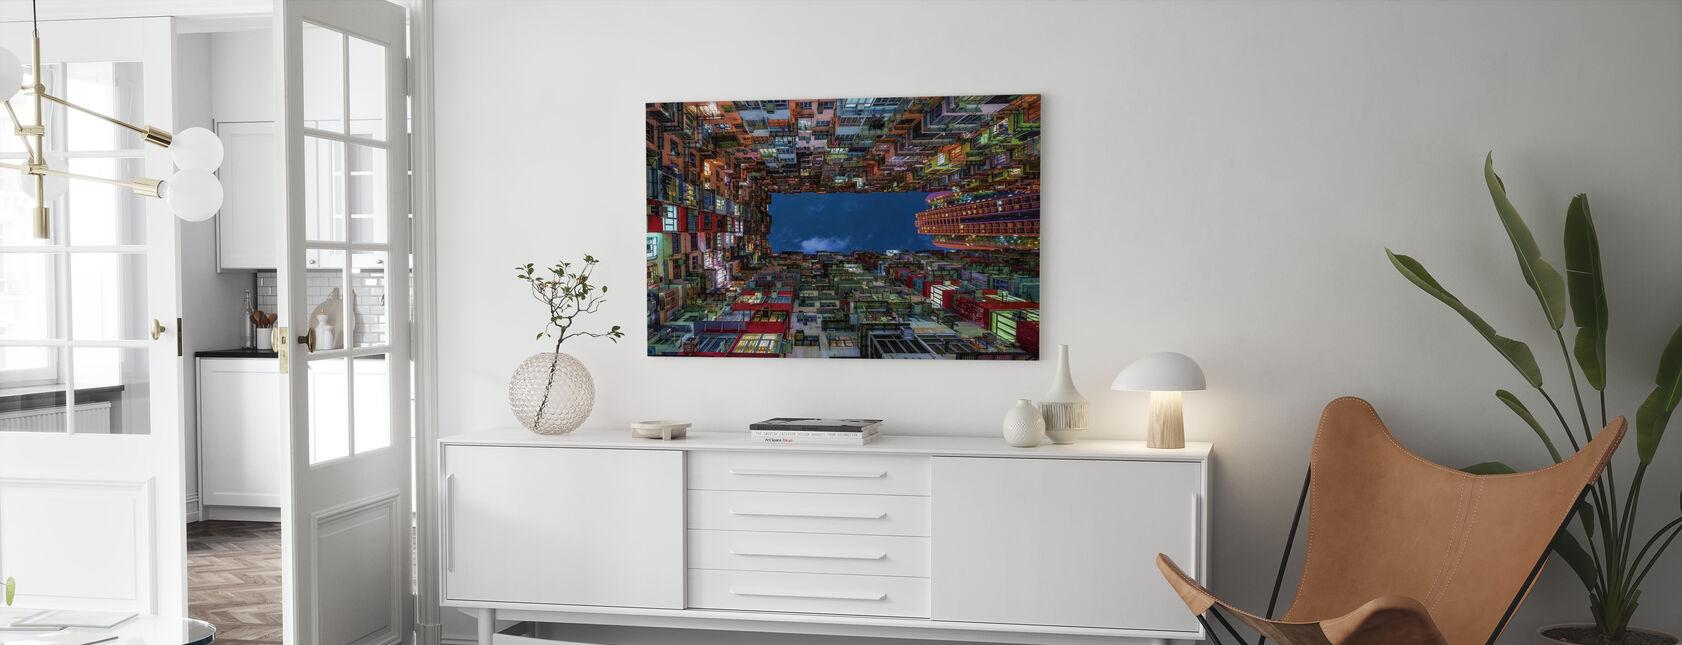 Uplift - Canvas print - Living Room